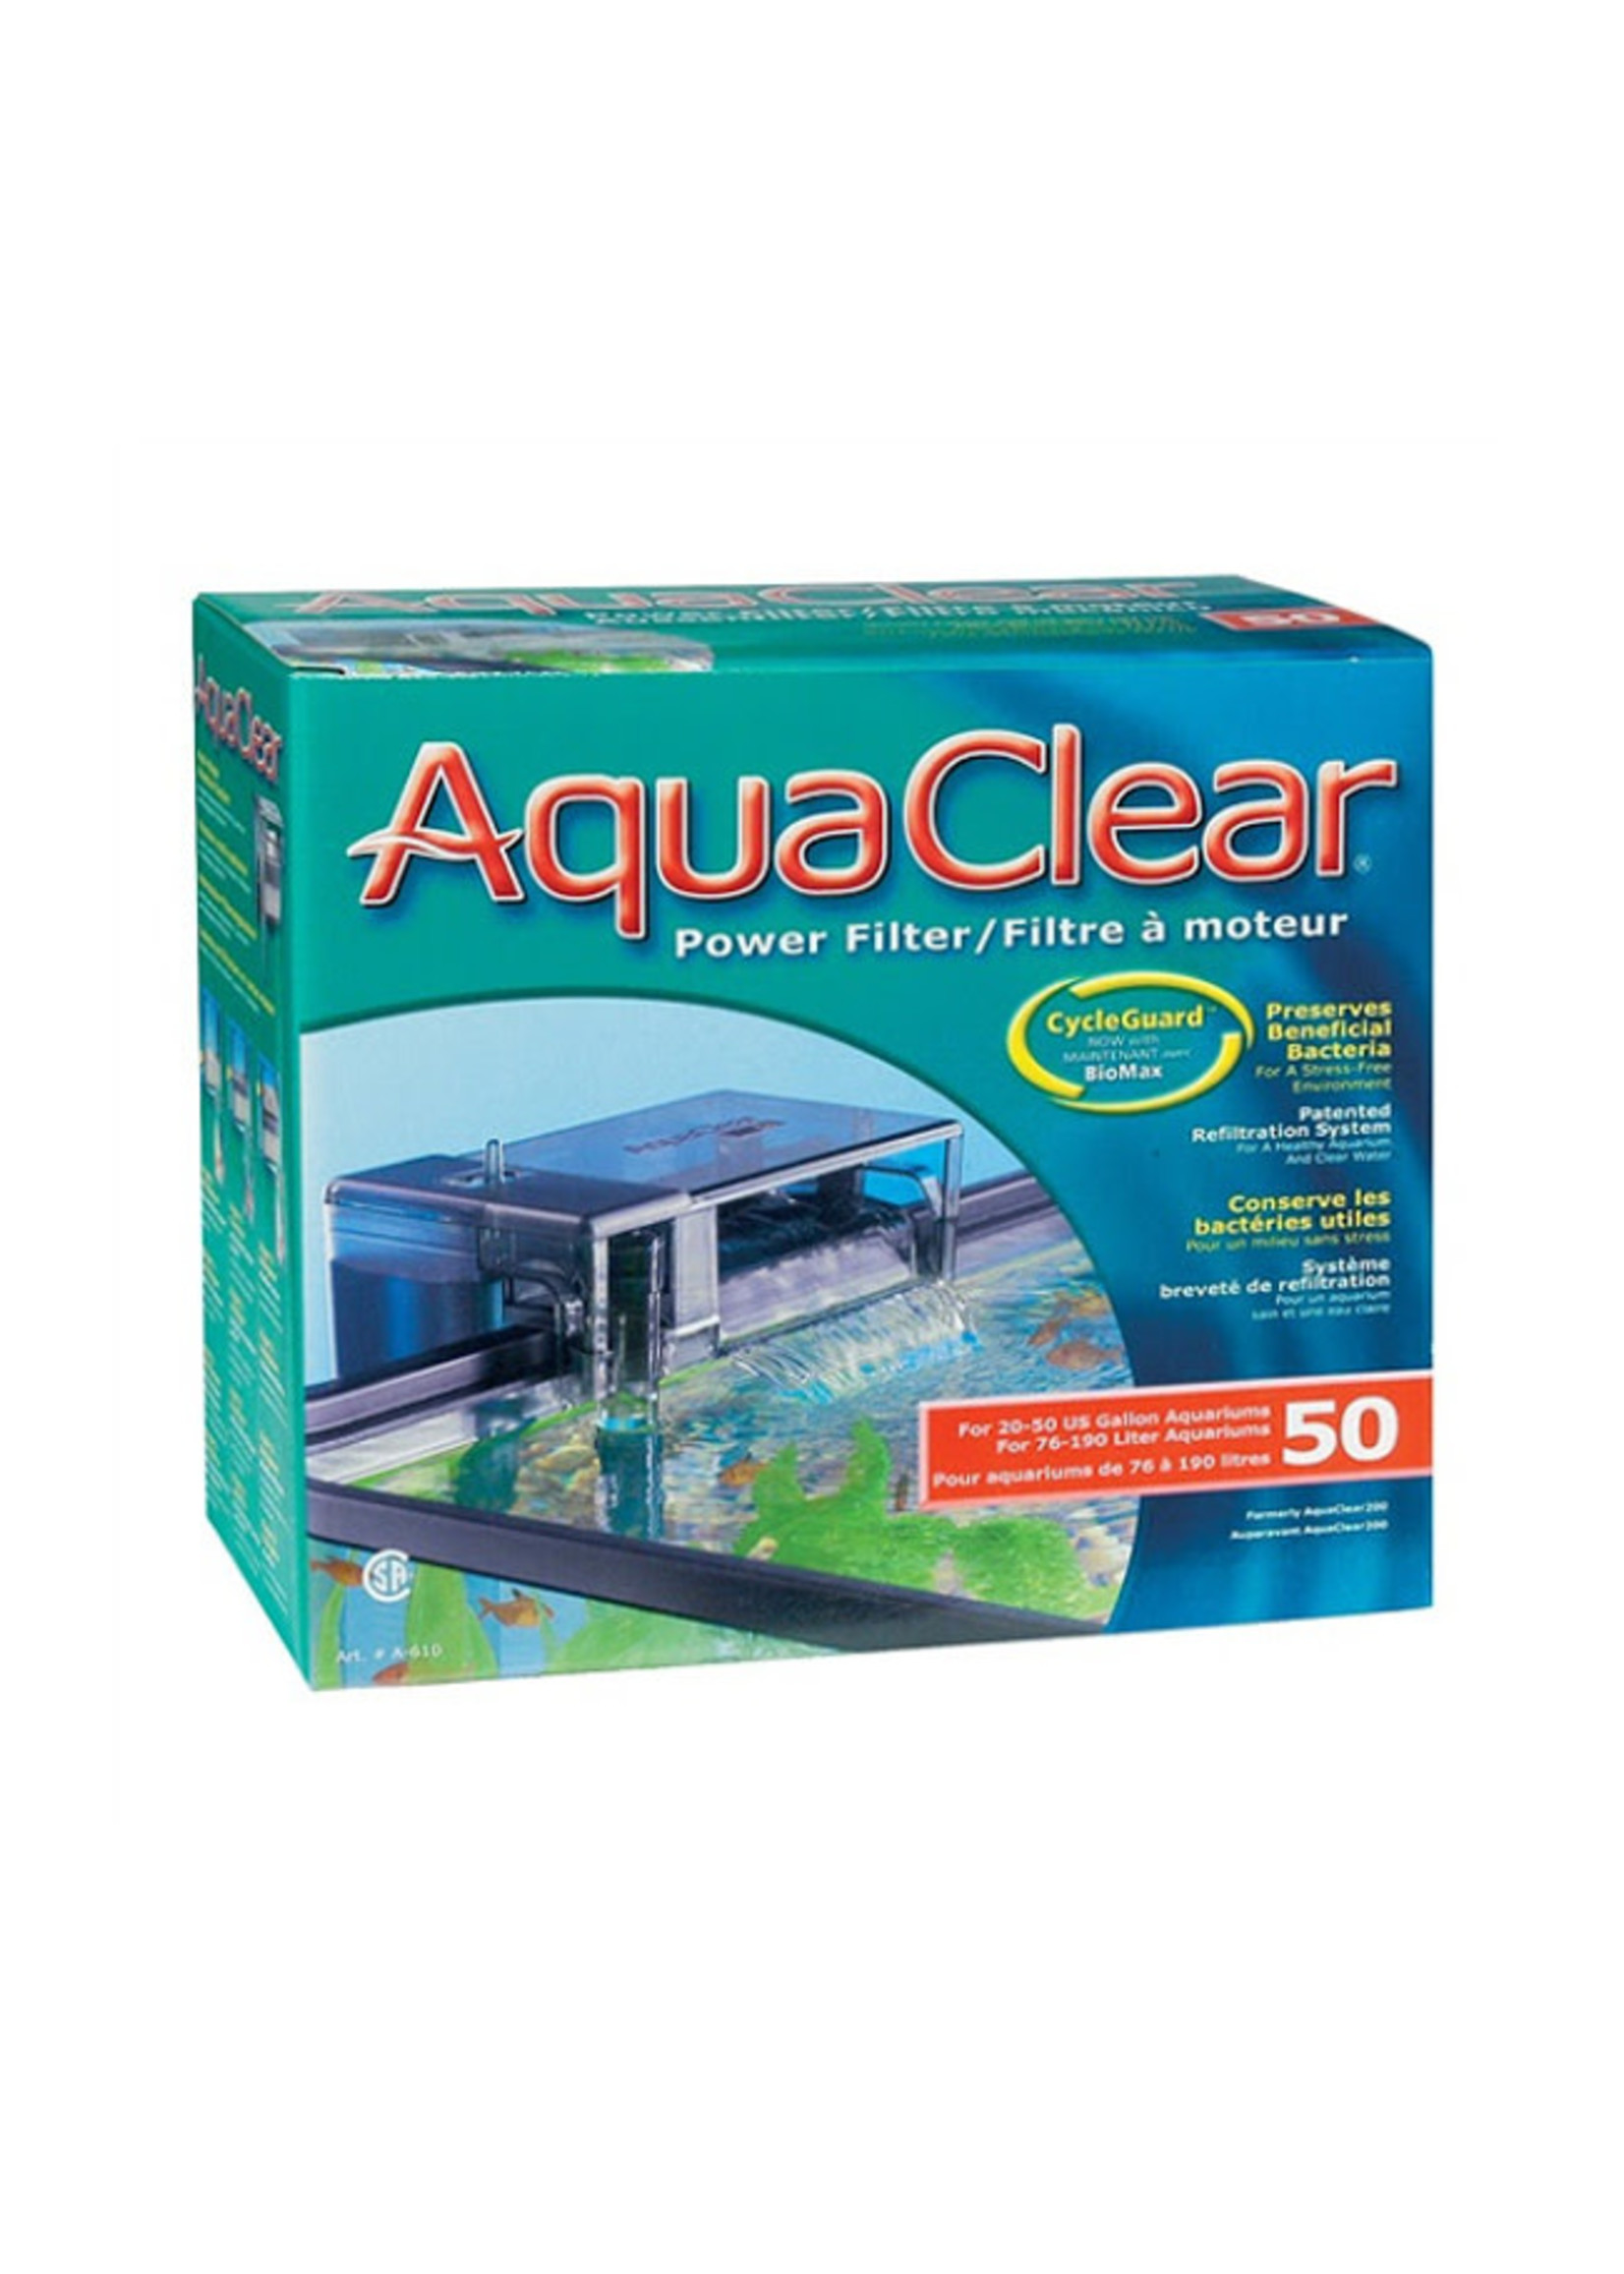 AquaClear AquaClear Power Filter 50